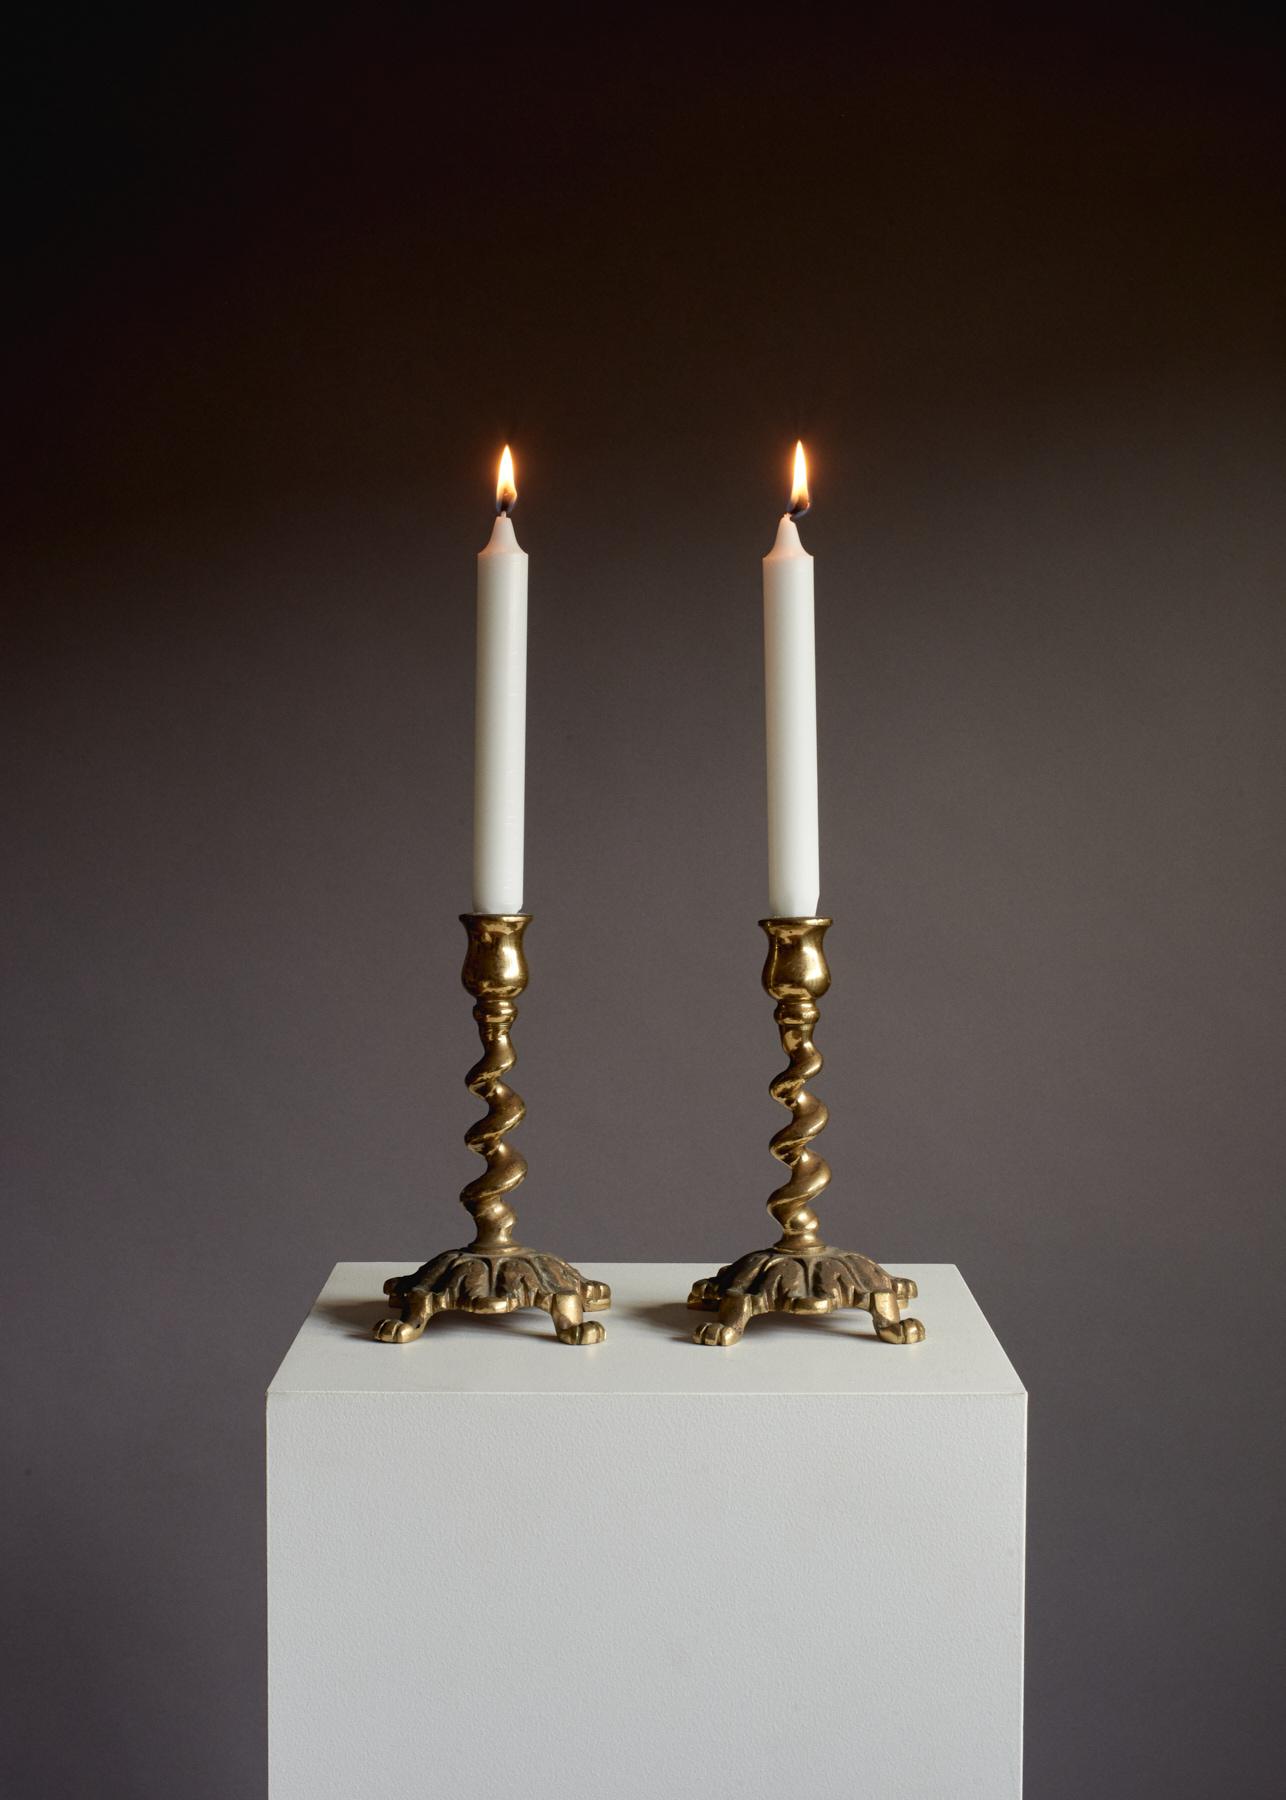 Vintage Brass Spiral Twist Candle Holders – Set of 2